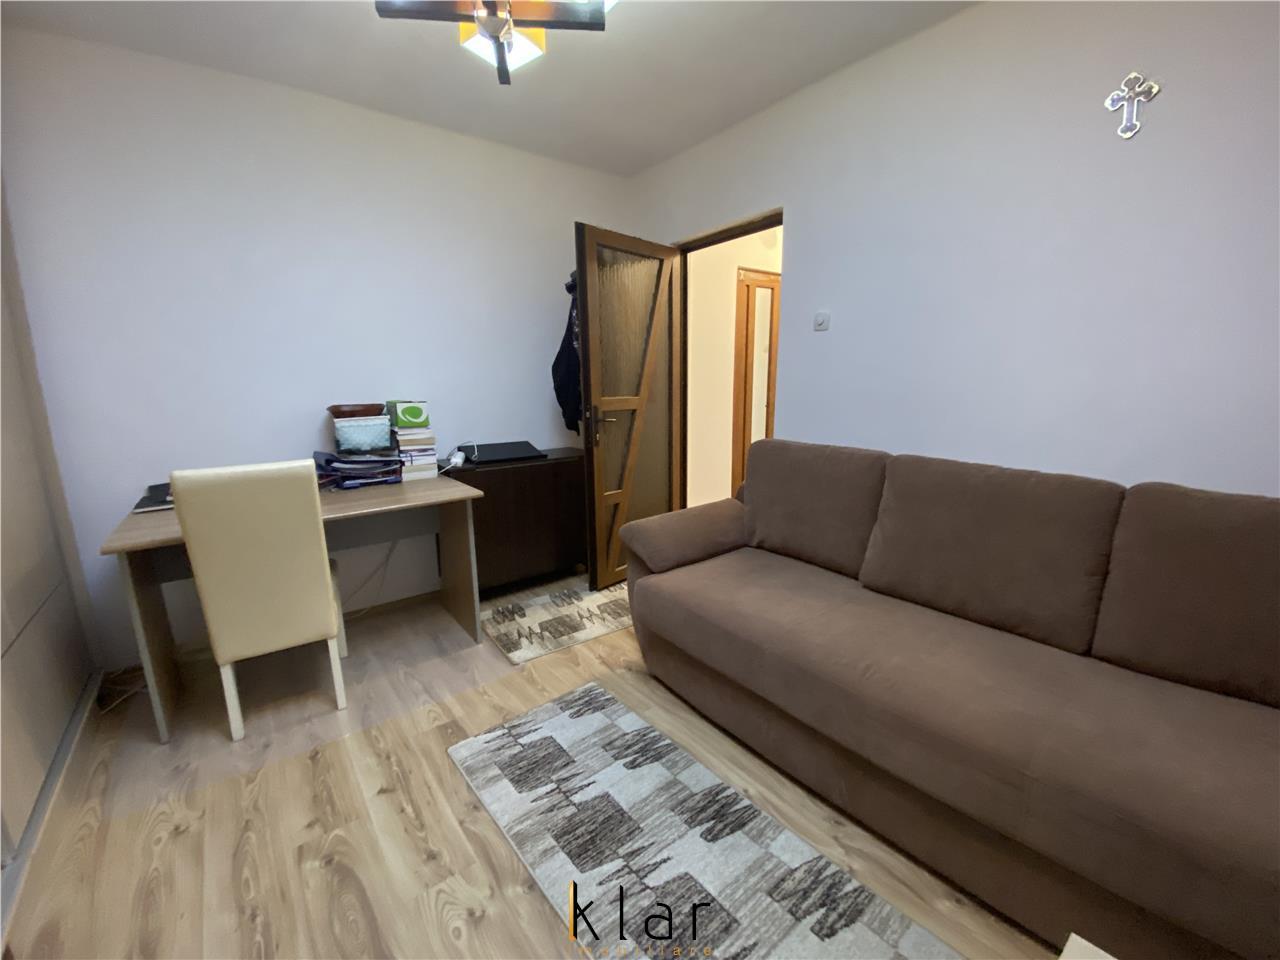 Apartament doua camere  mobilat,utilat Manastur zona linistita